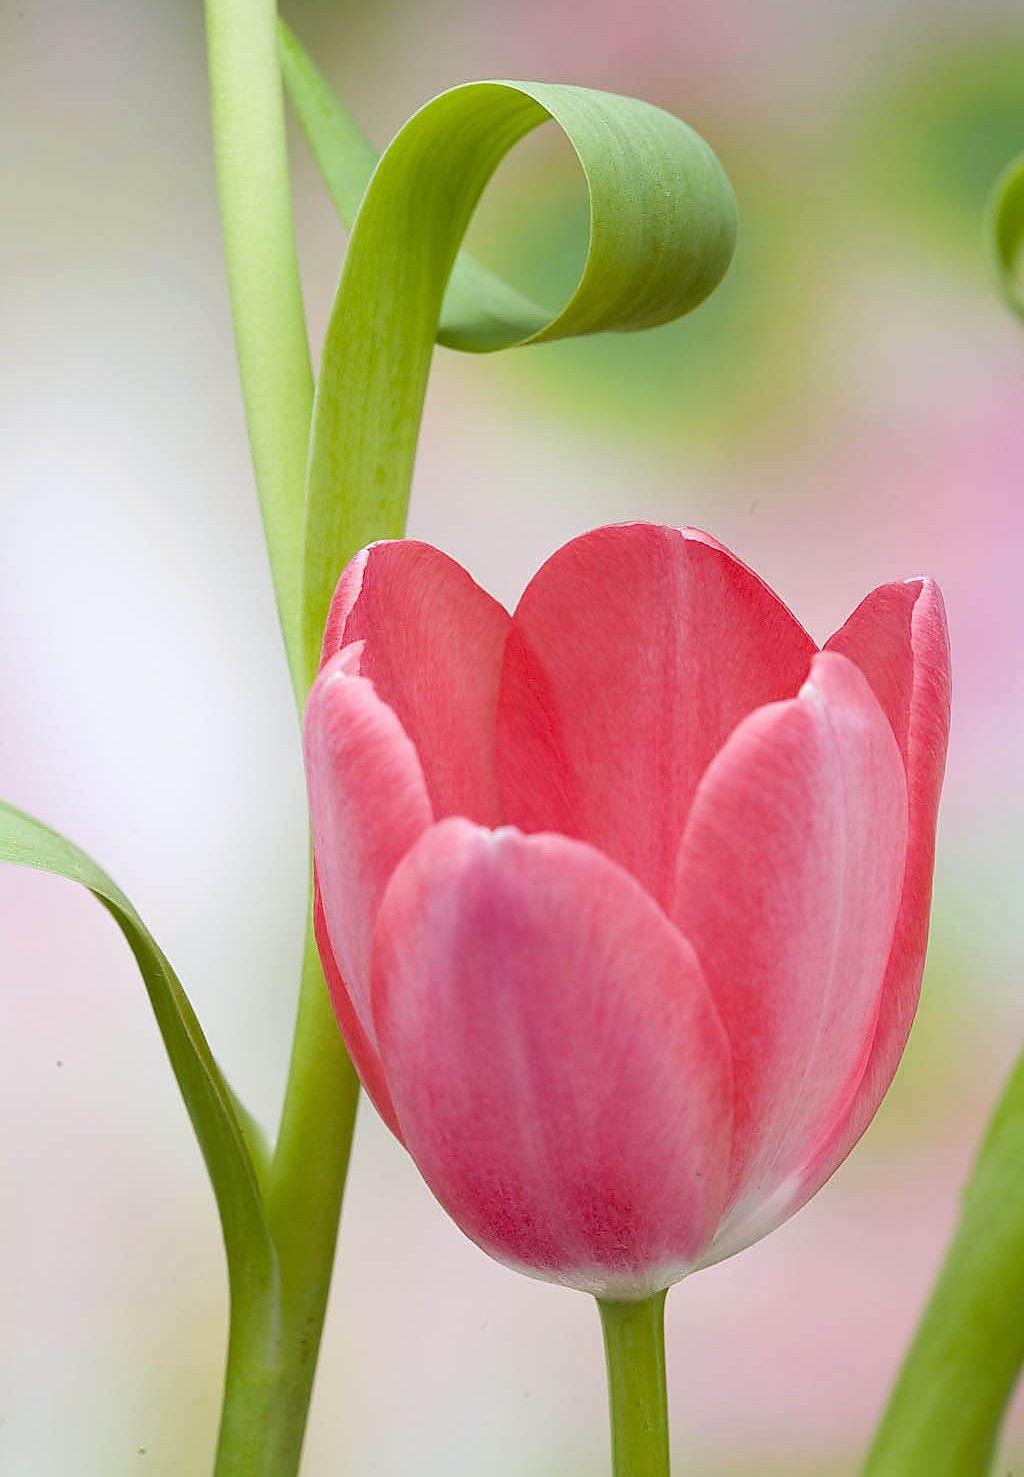 Pin By Nong Kanchana On ϡ Flowers Tulipa Spring Garden Flowers Spring Flowers Flowers